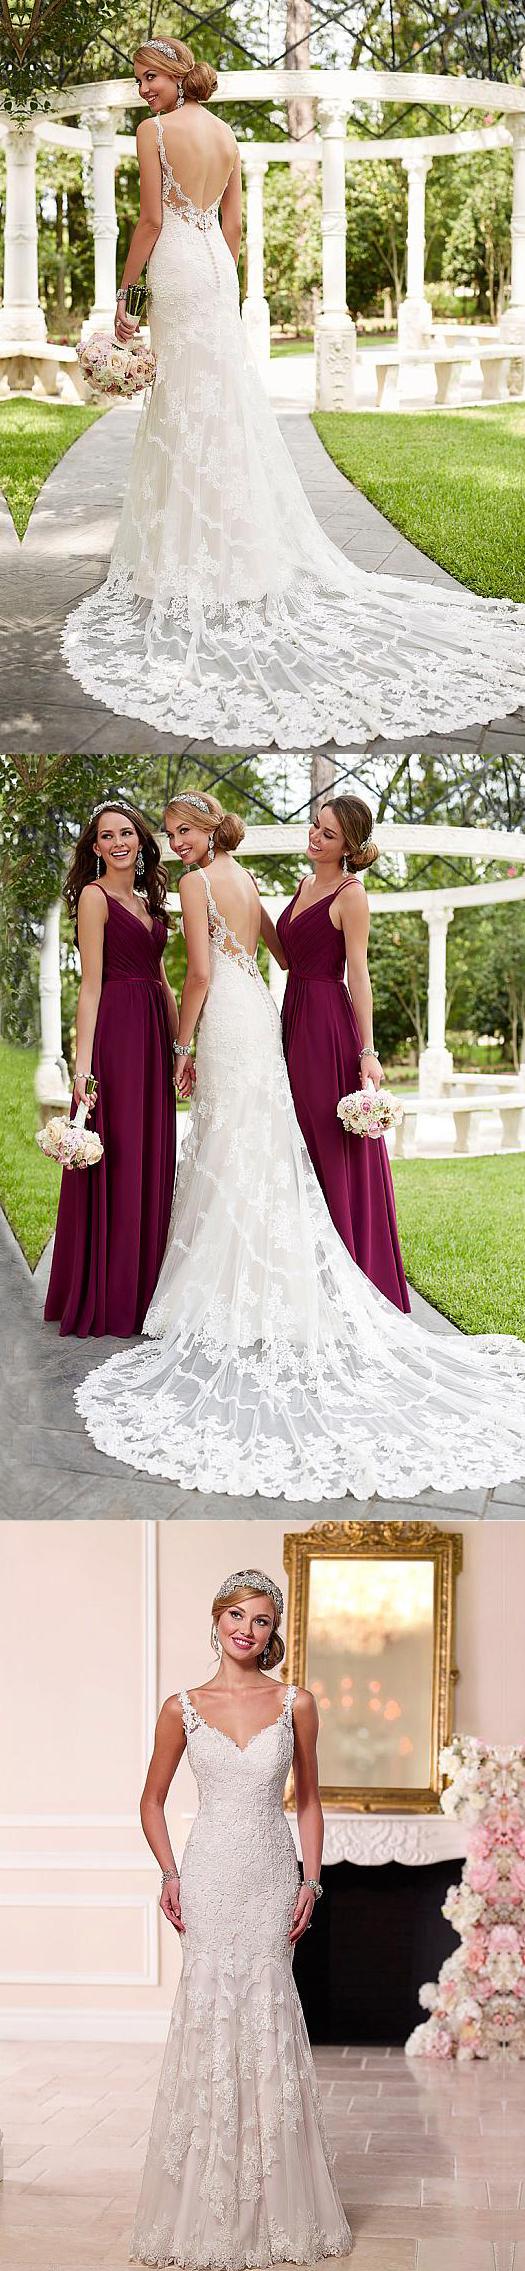 Elegant u romantic mermaid wedding dresses gowns ideas that comes